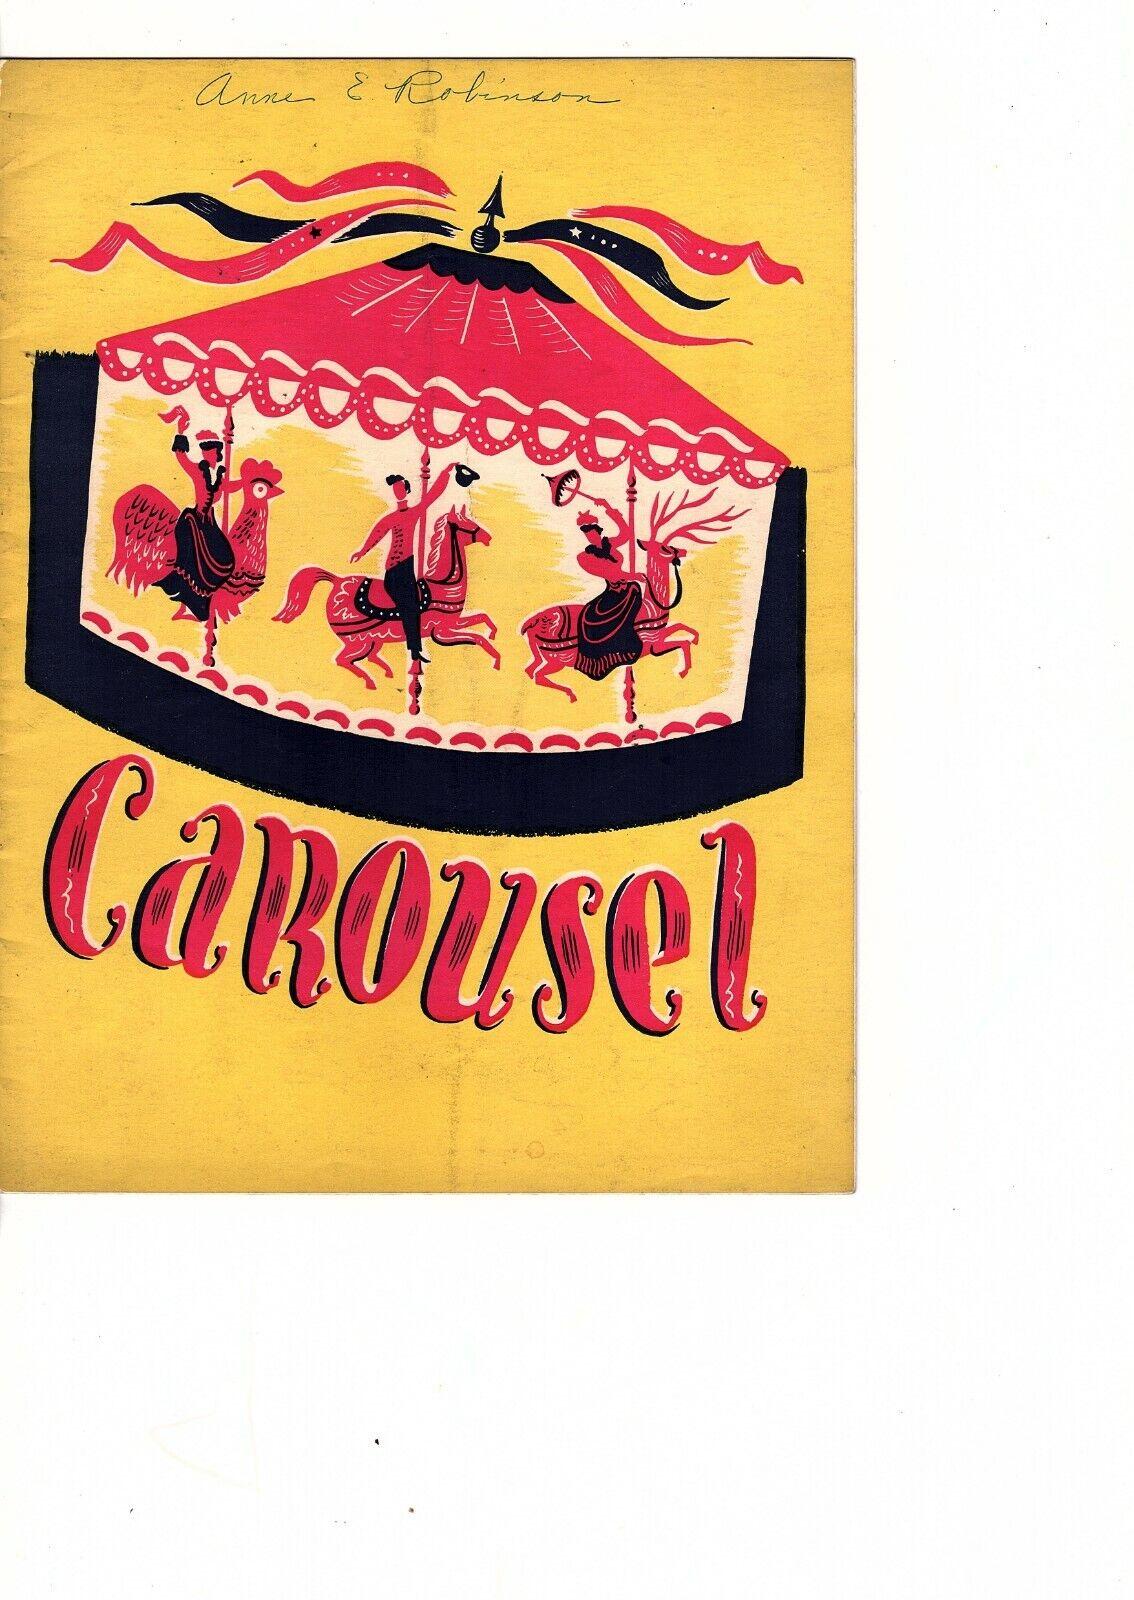 Carousel Original Production Souvenir Program Broadway 1947